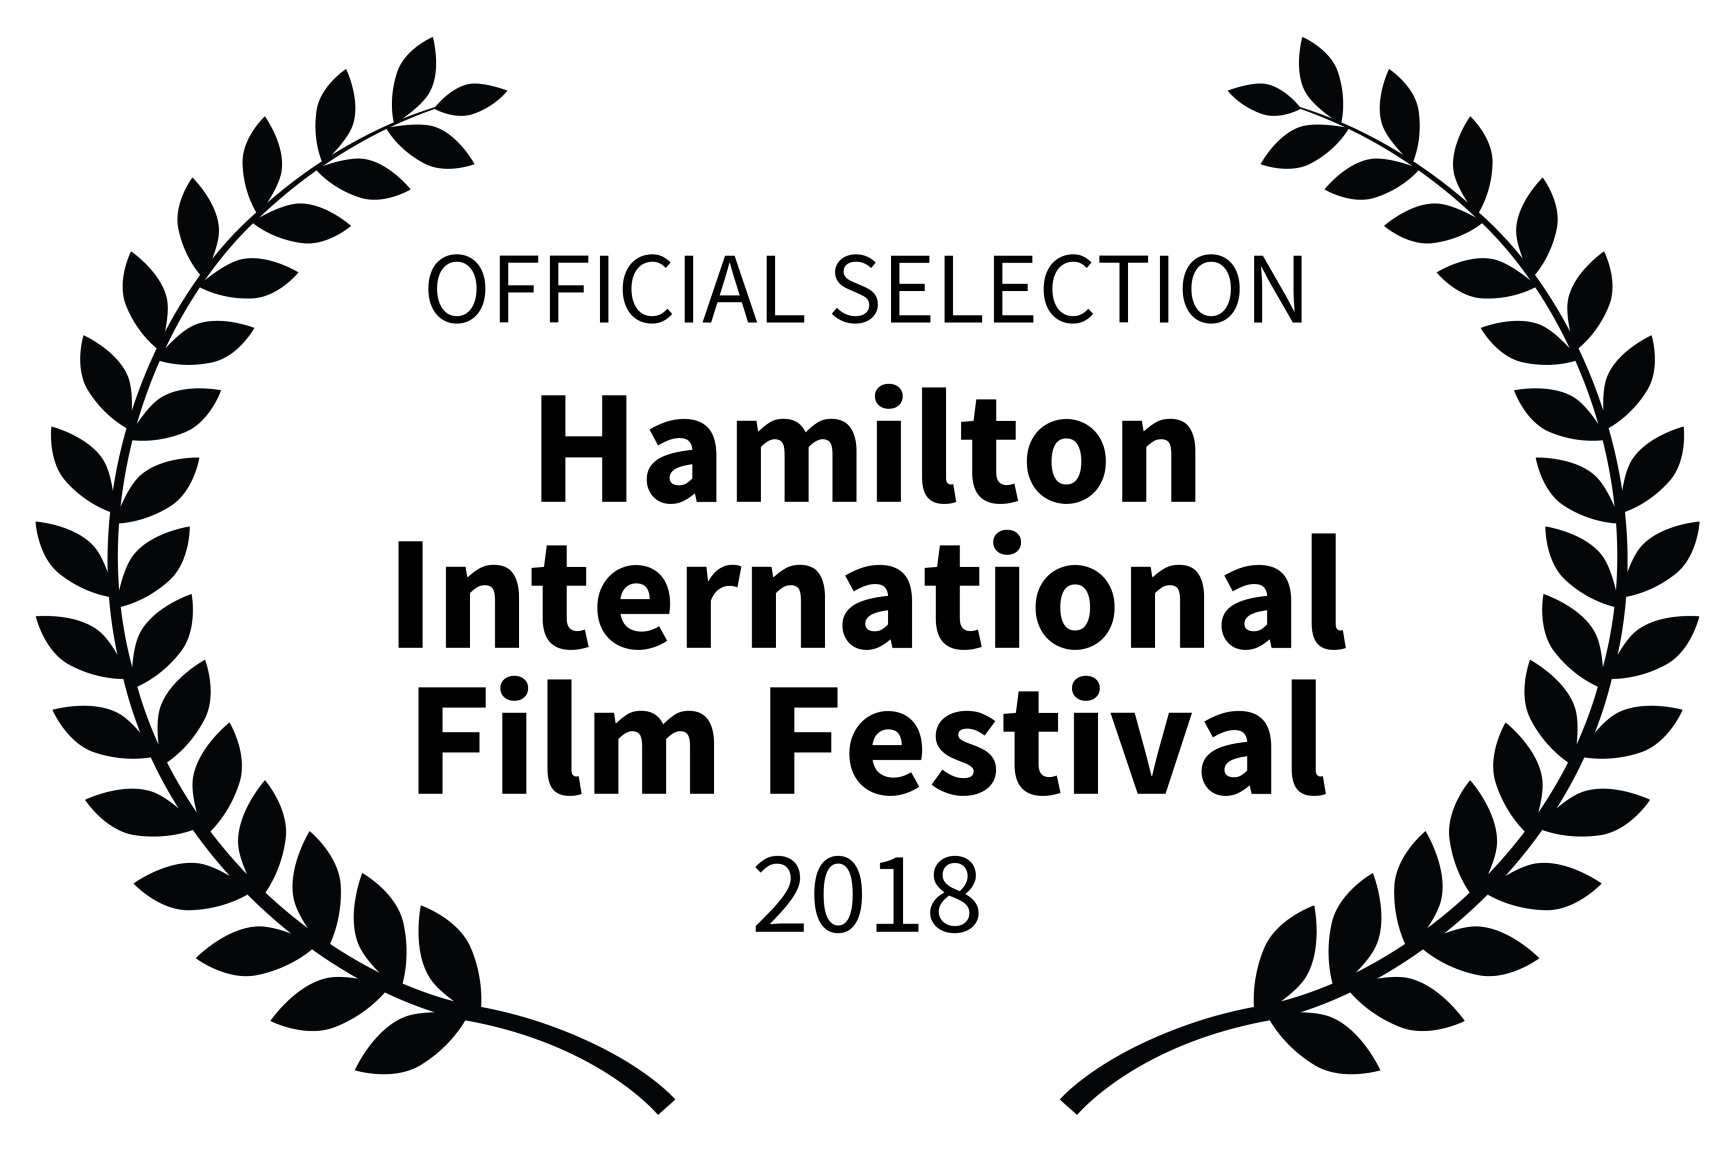 OFFICIAL SELECTION - Hamilton International Film Festival - 2018.jpg